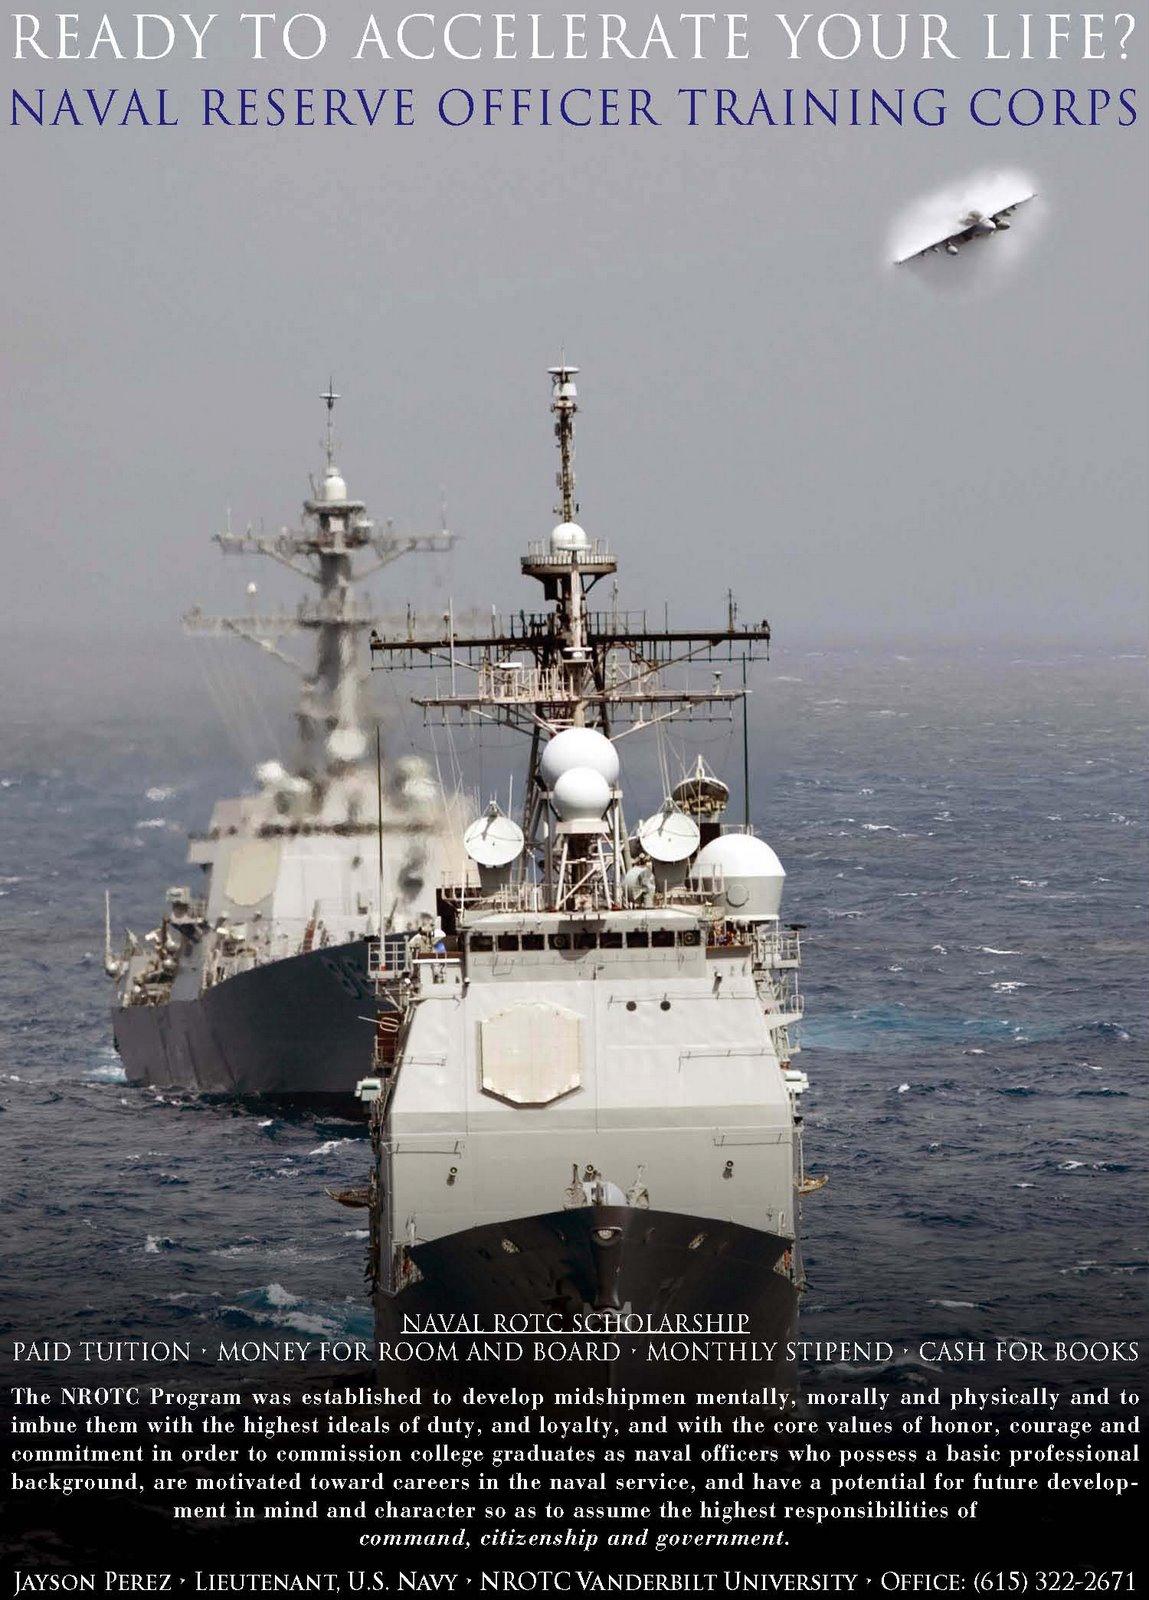 VAN3026_F_Naval Reserve Officer Training Corps.jpg